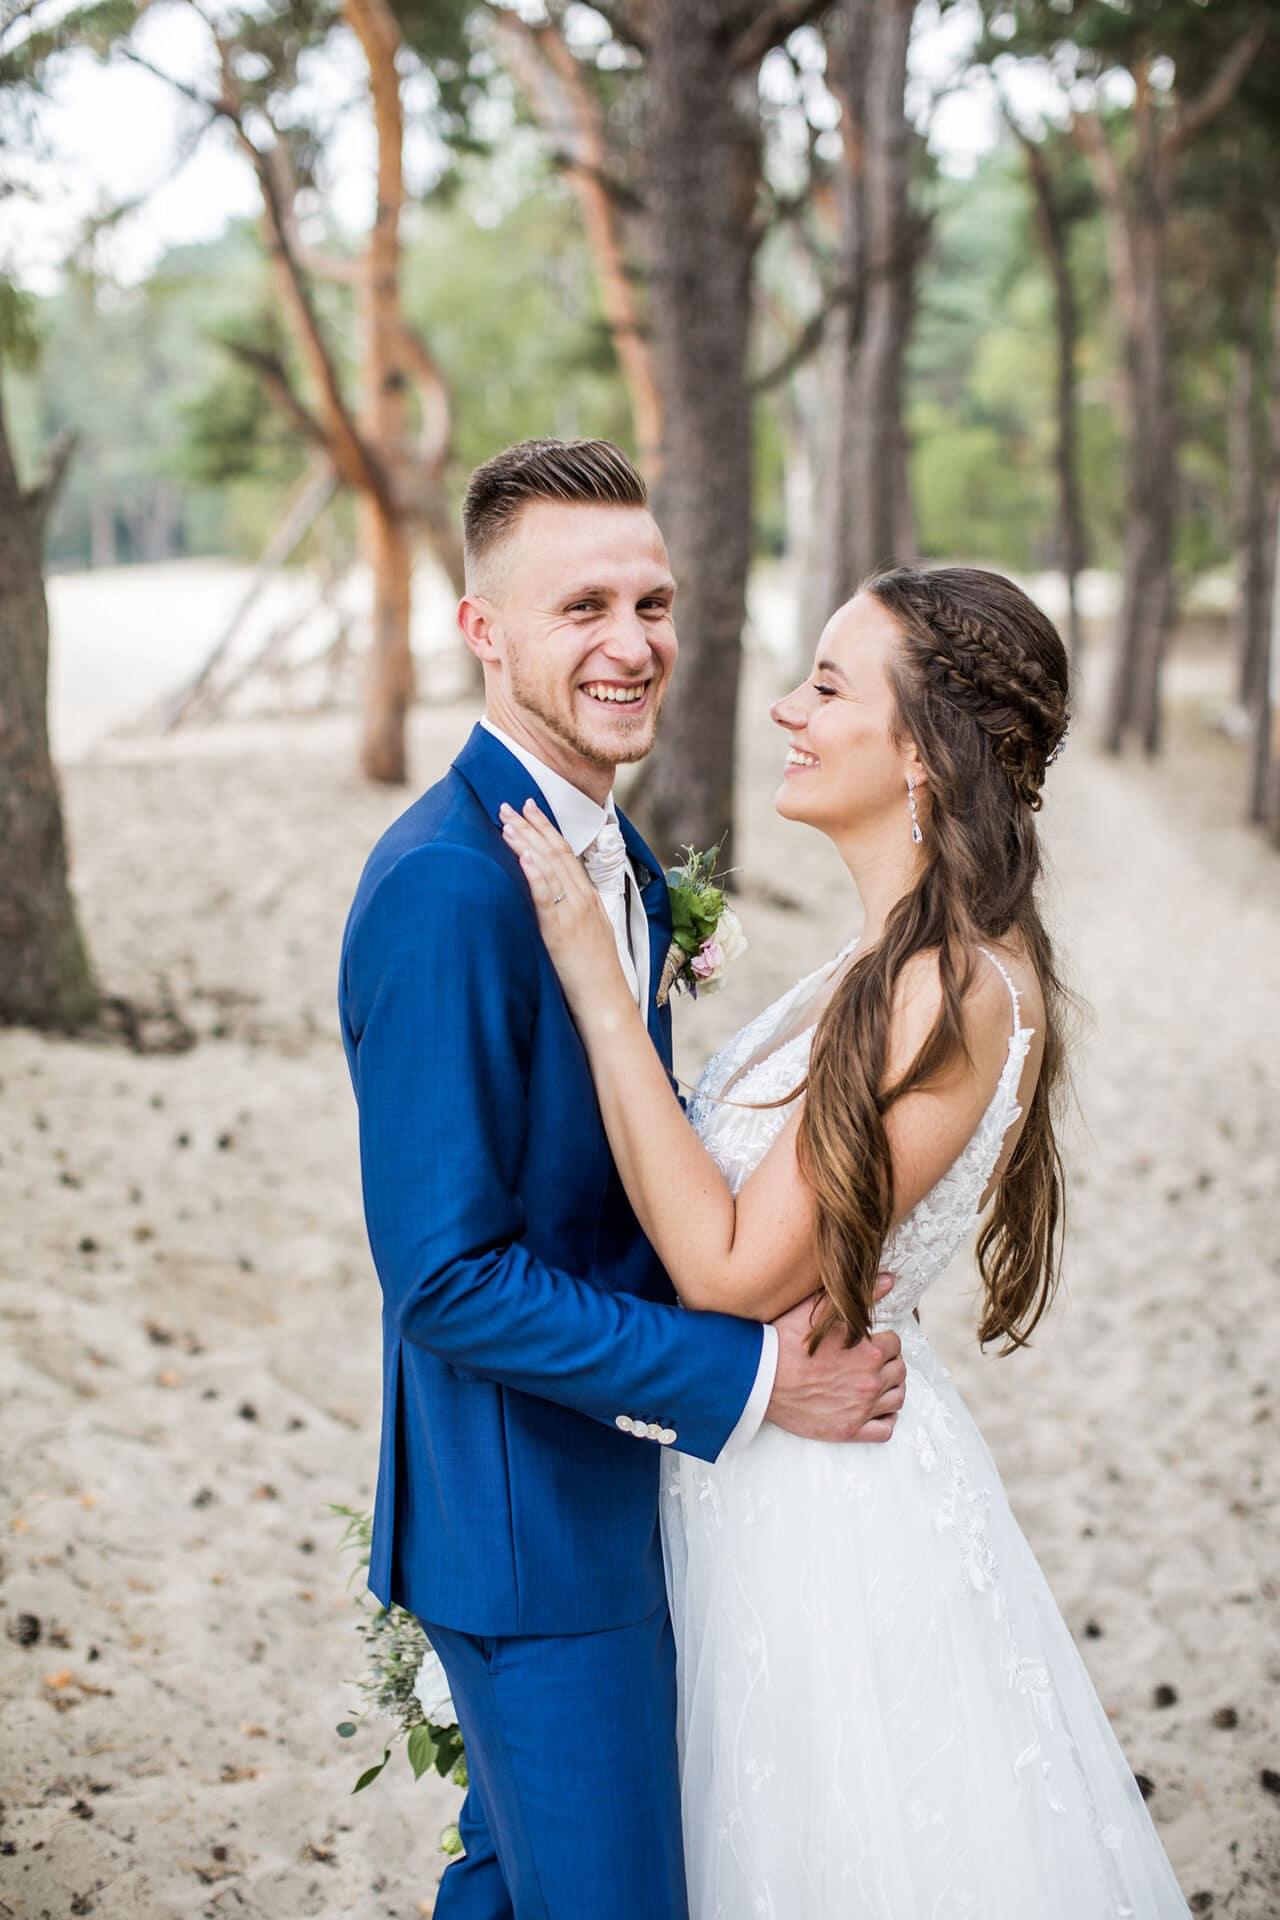 Wedding Photographer Soesterduinen